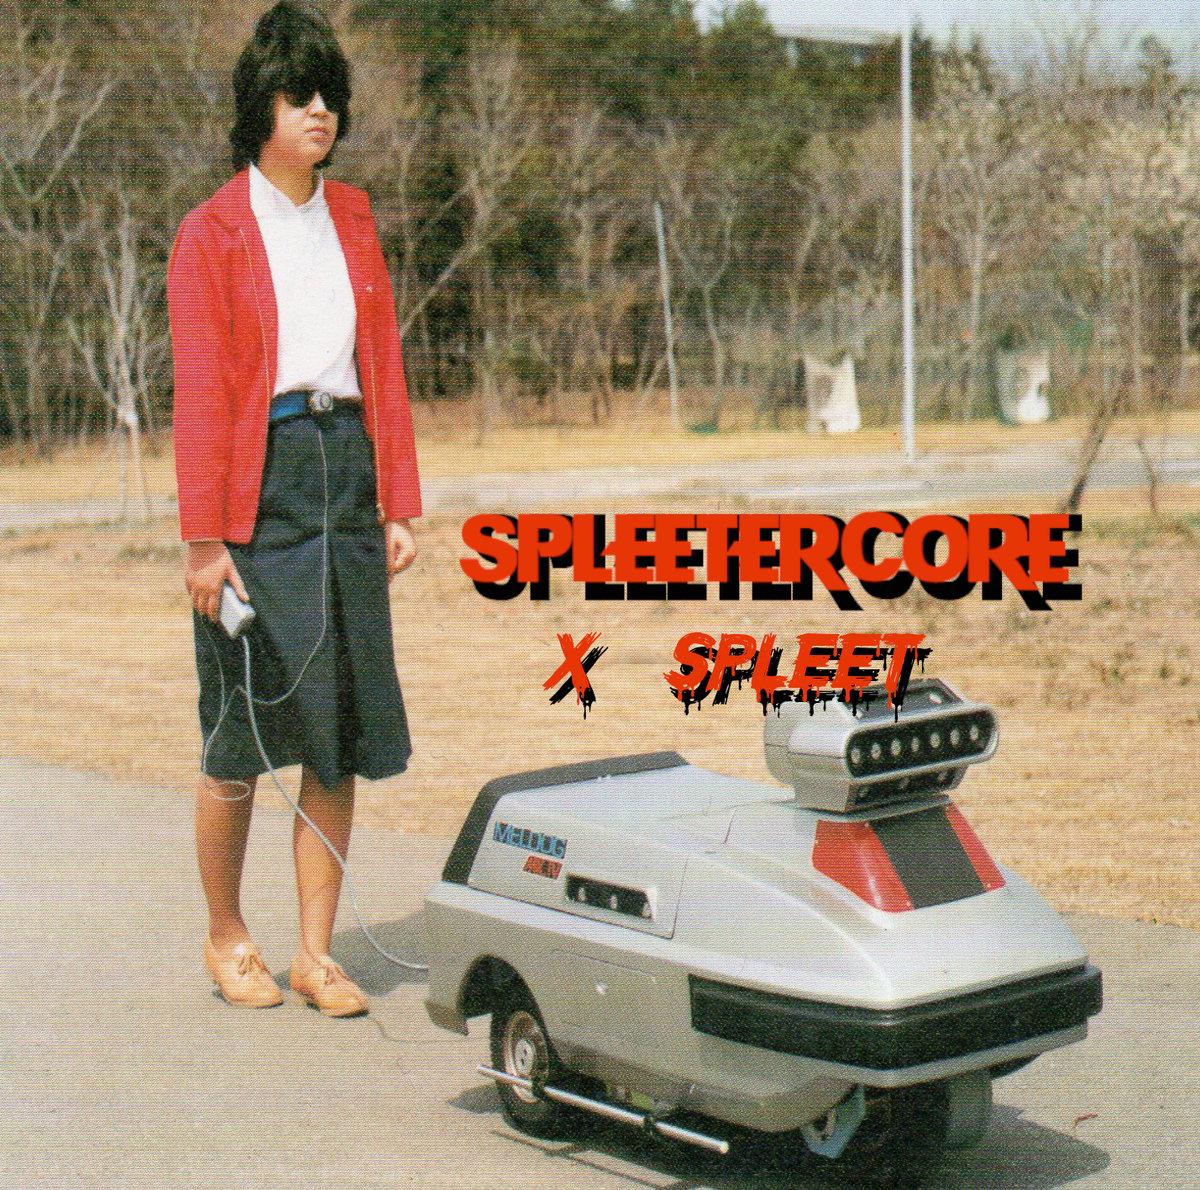 copertina album X-spleet // Spleetercore Vol. 1